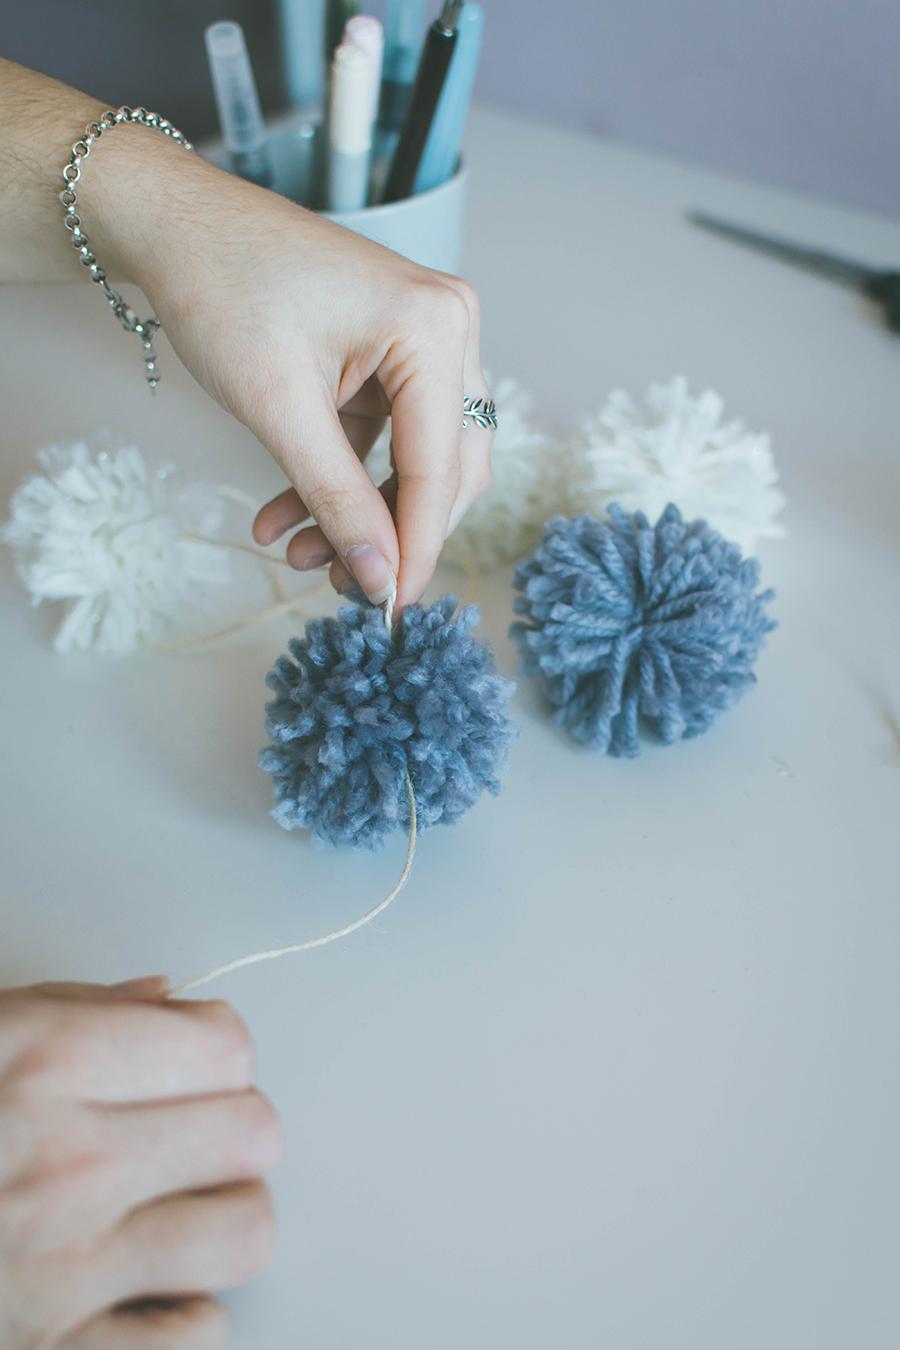 DIY Pompom Garland How To Assemble